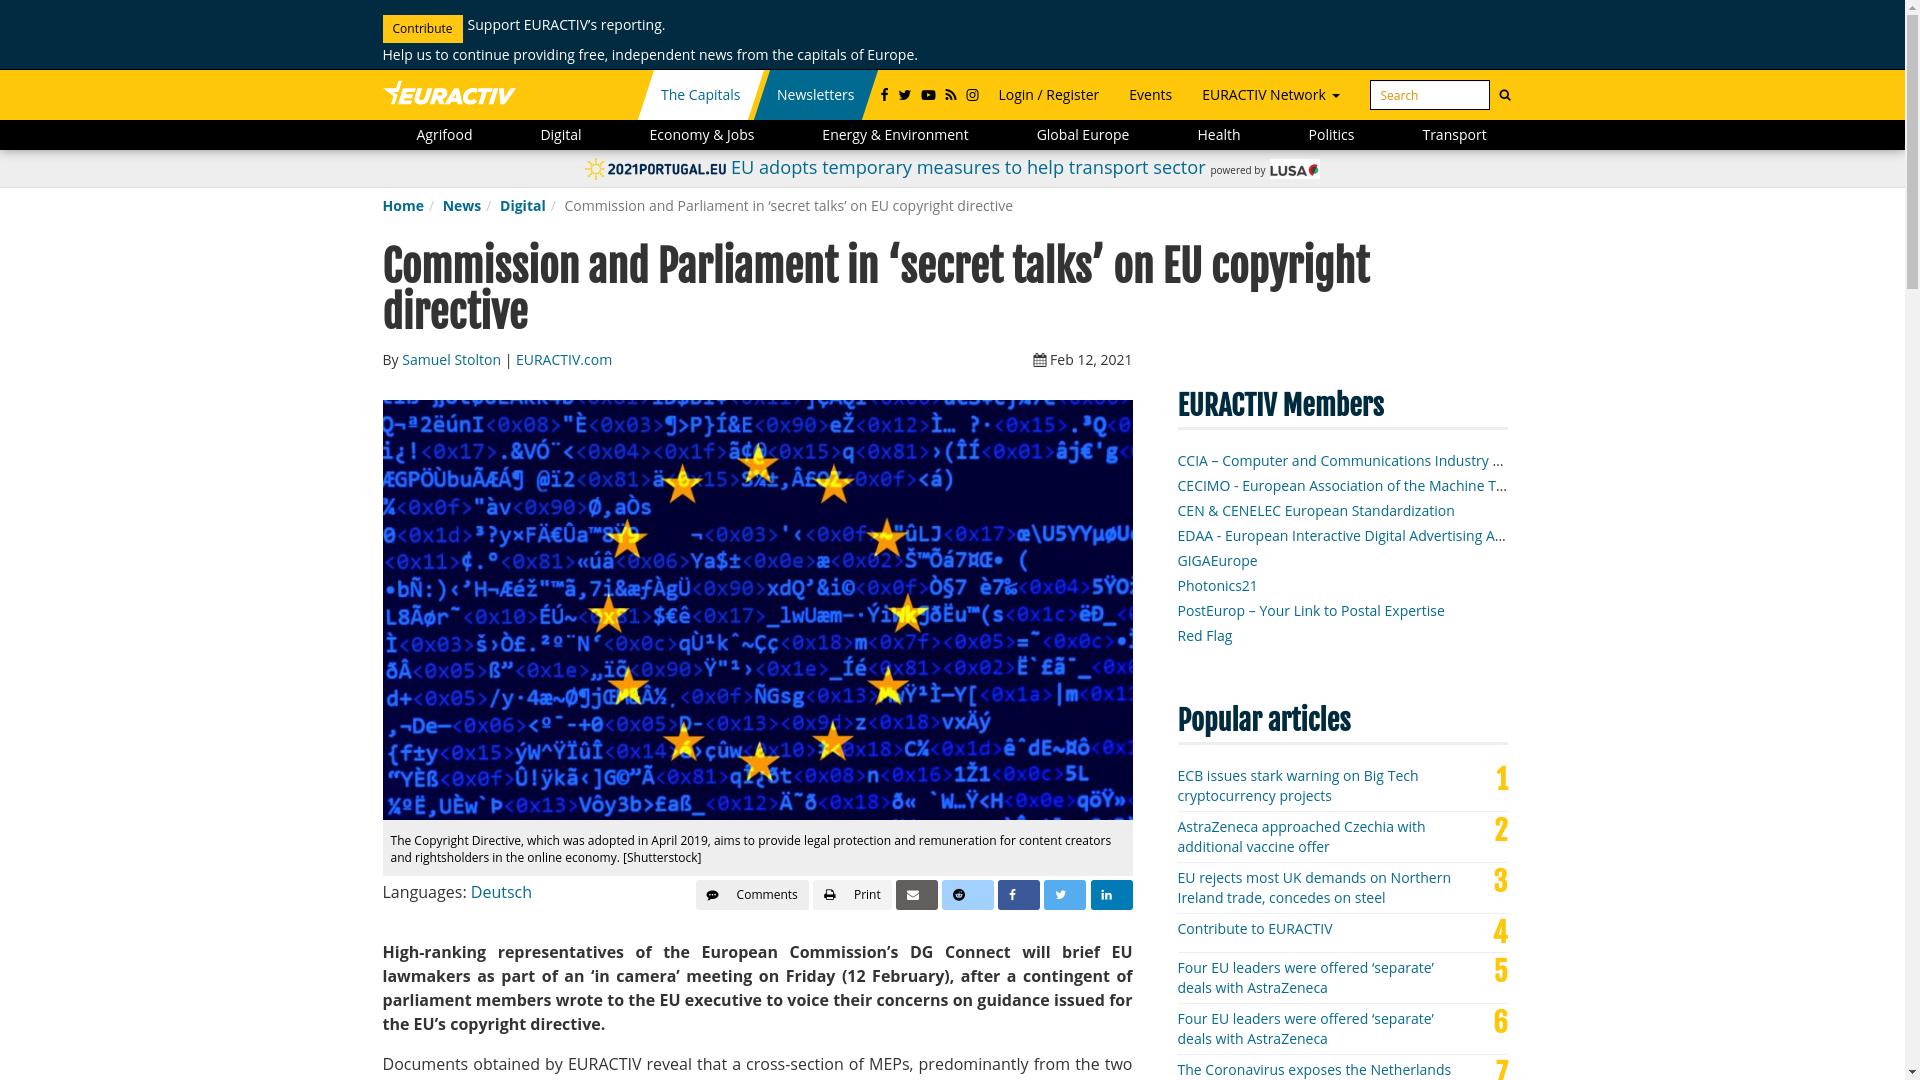 Fairness Rocks News Commission and Parliament in 'secret talks' on EU copyright directive